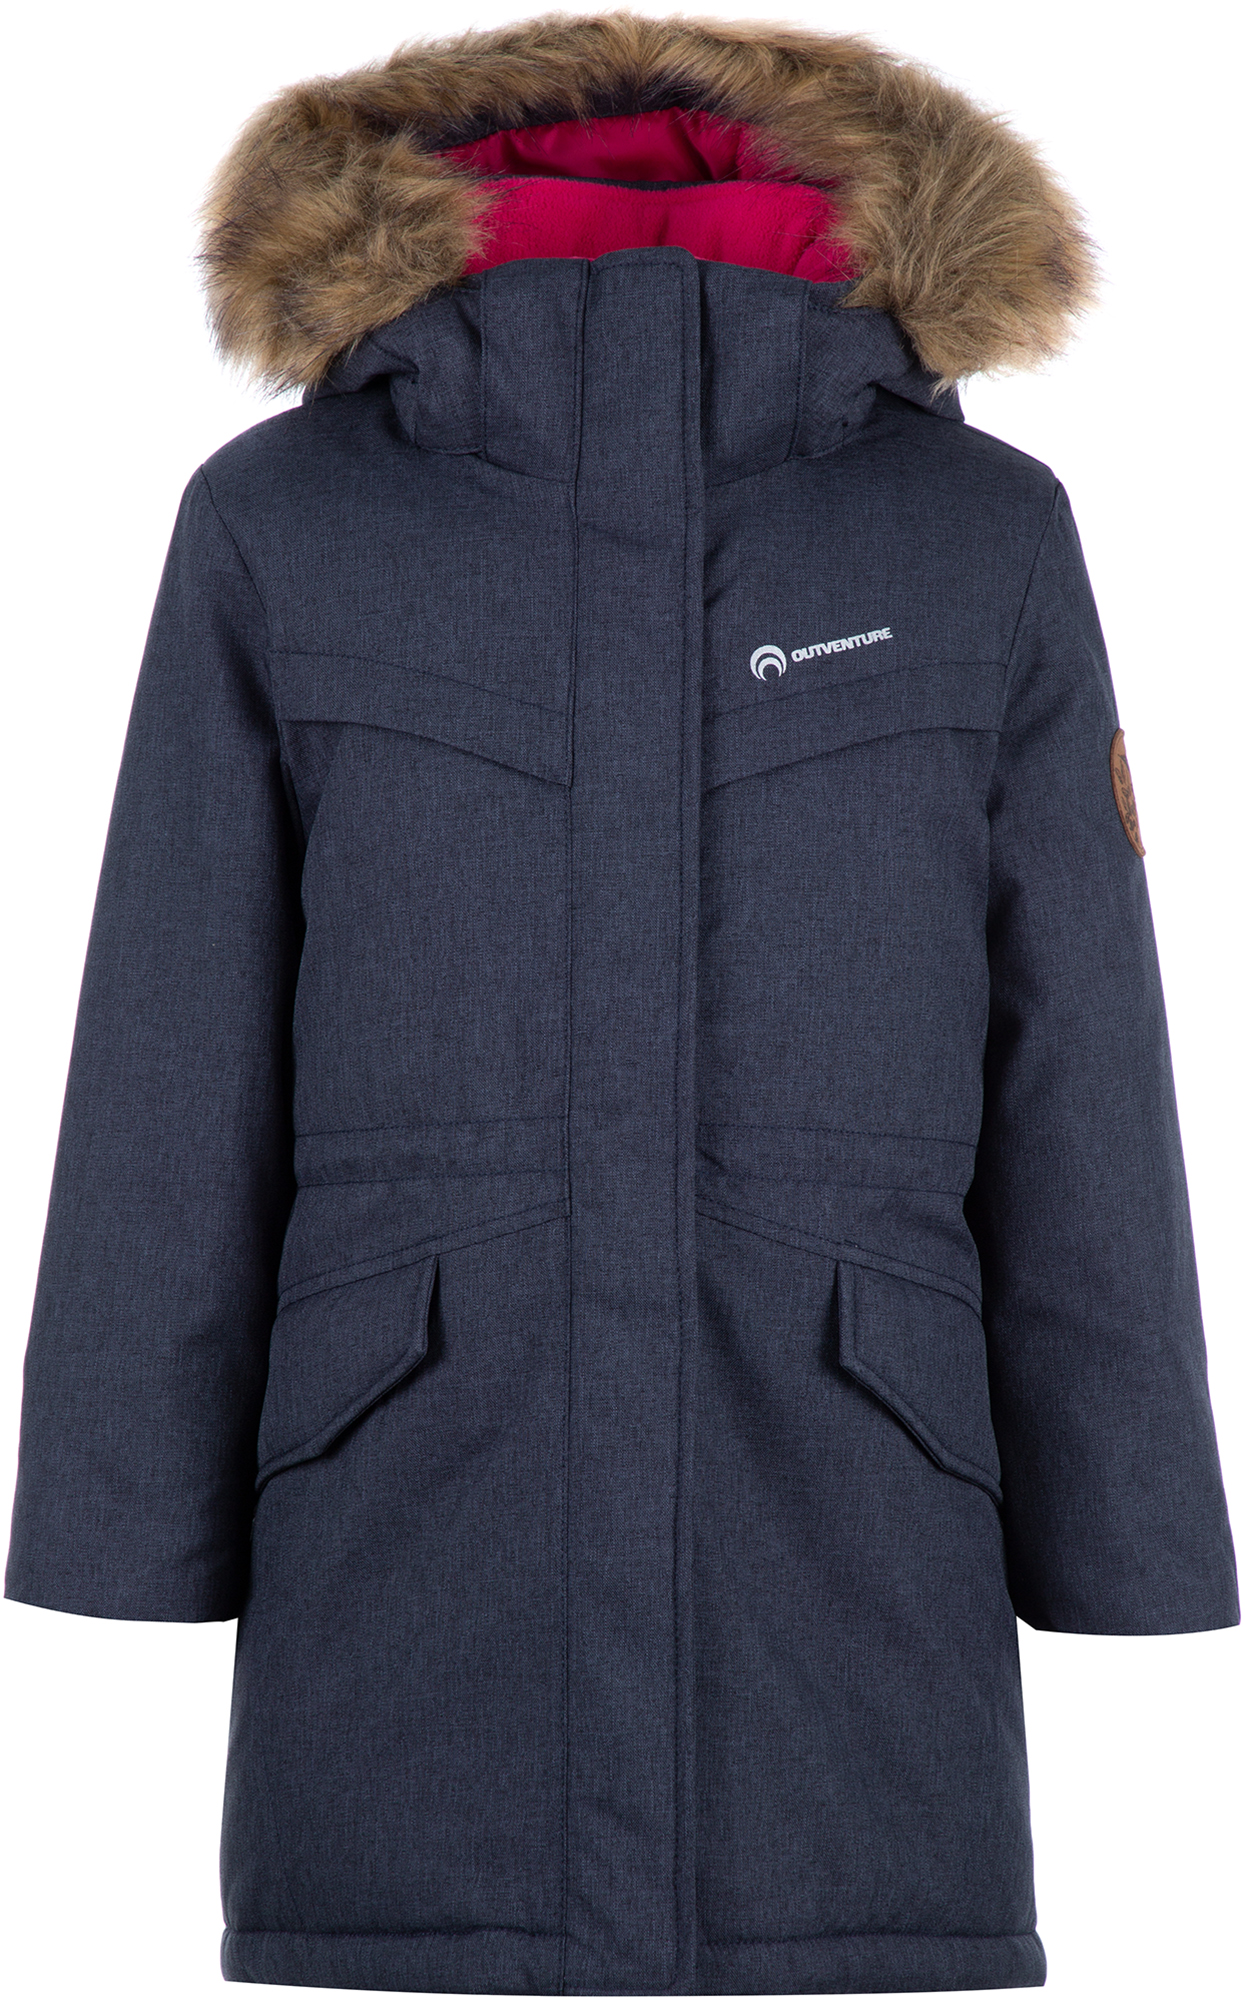 цена на Outventure Куртка утепленная для девочек Outventure, размер 110